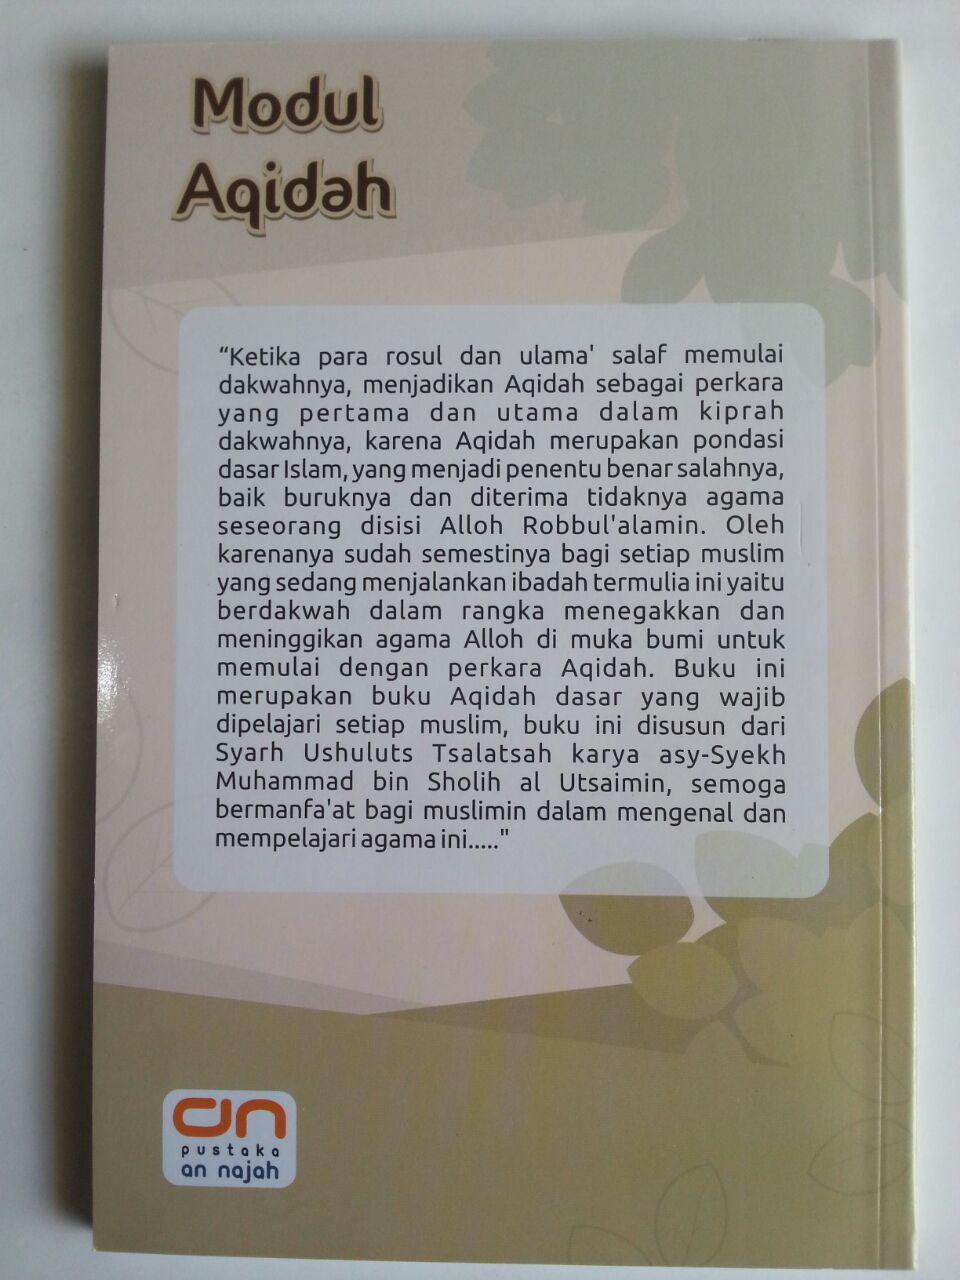 Buku Modul Aqidah Buku Pegangan Pengajaran Anak Islam cover